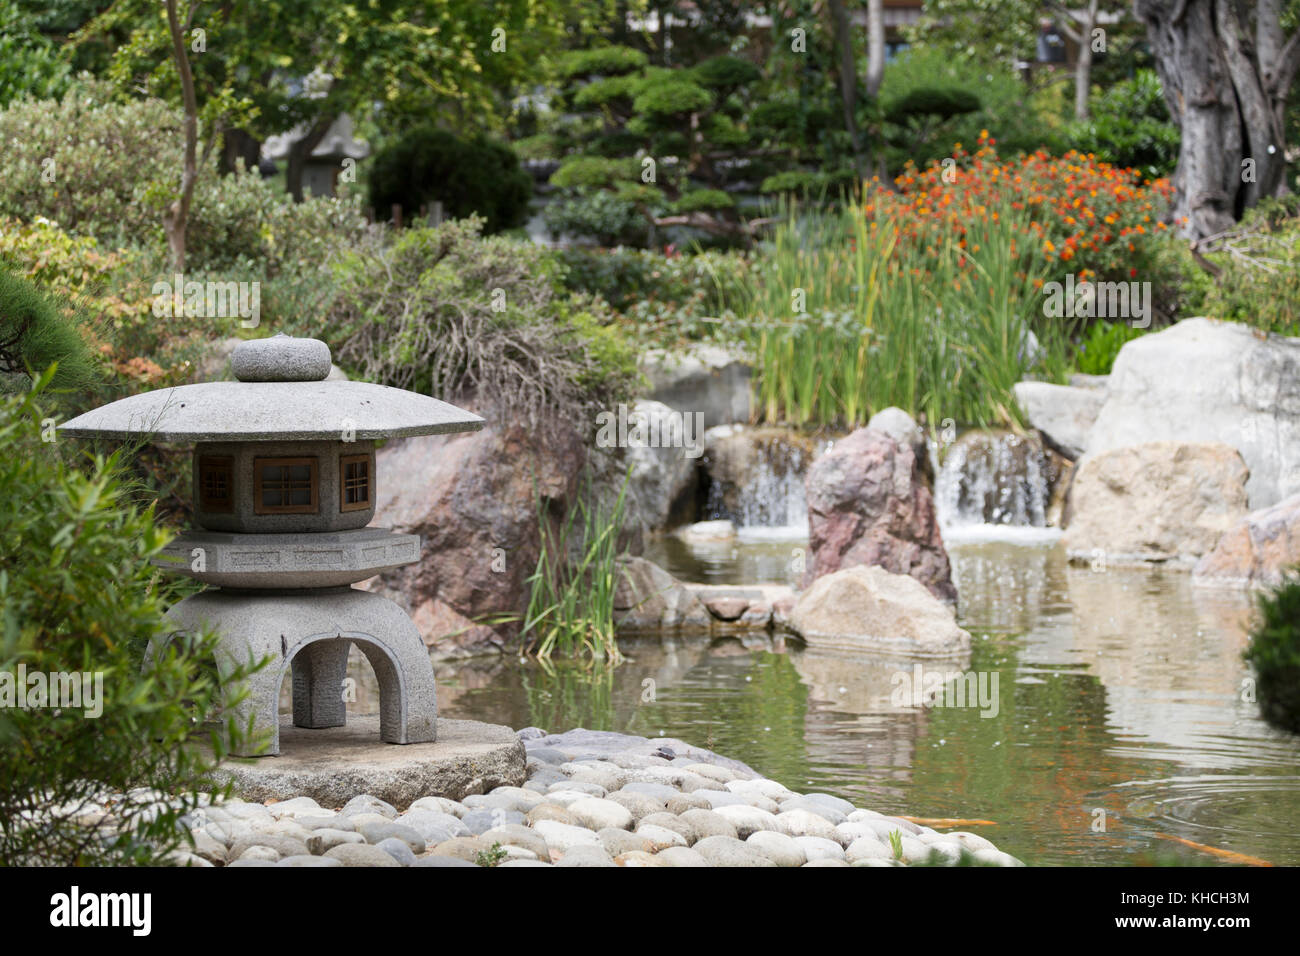 Monaco japanese garden stock photos monaco japanese for Jardin japonais monaco